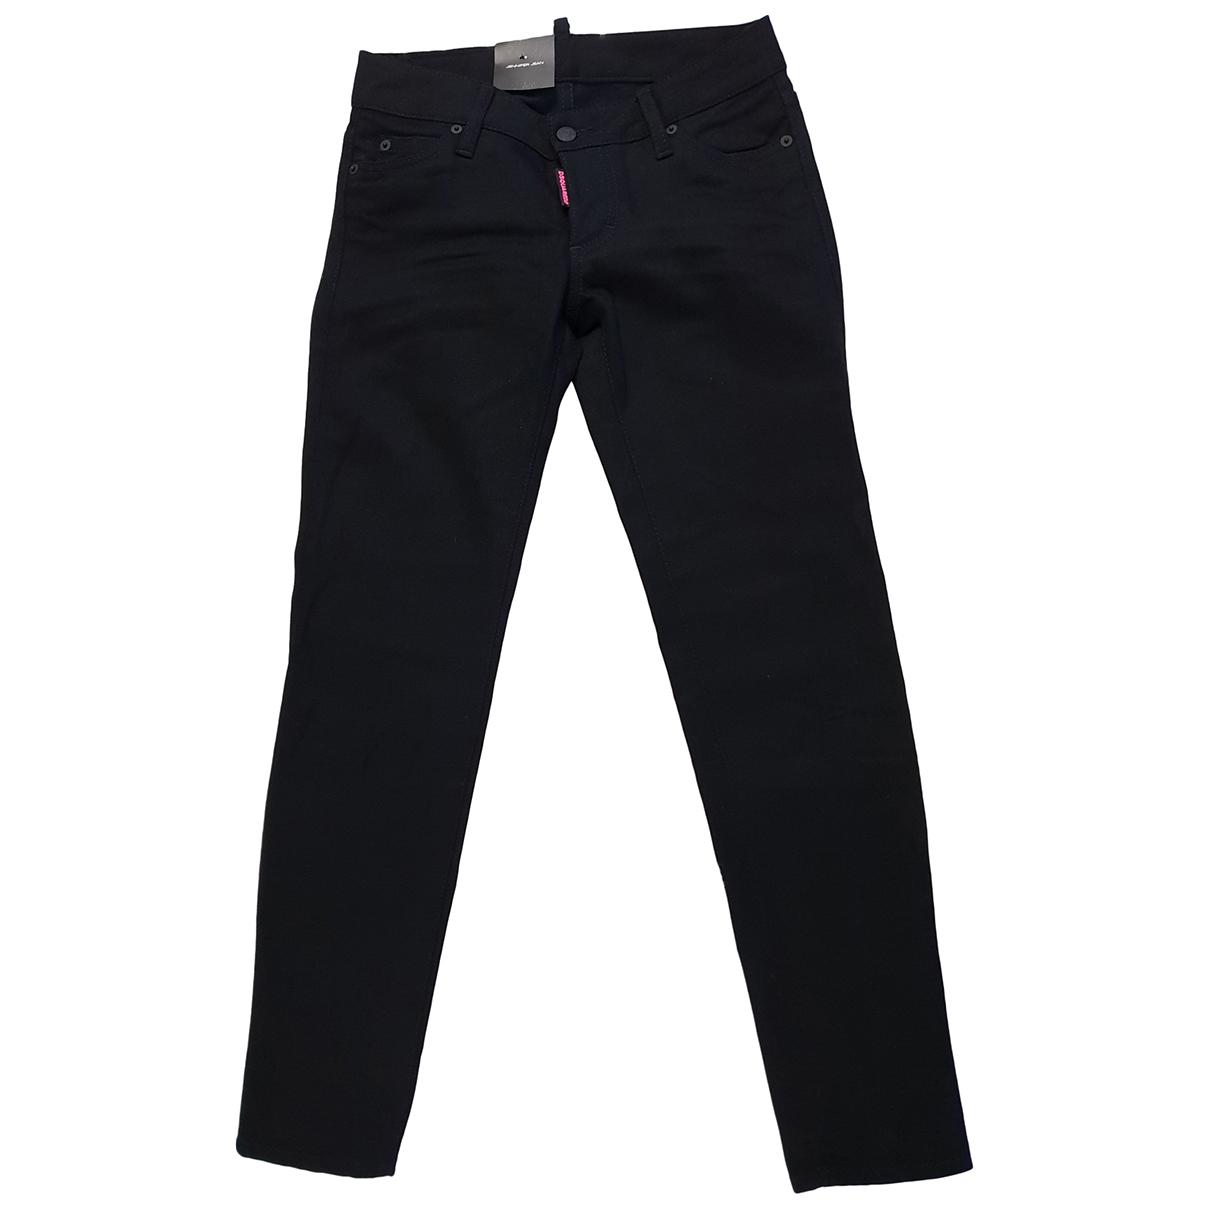 Dsquared2 \N Black Denim - Jeans Jeans for Women 26 US